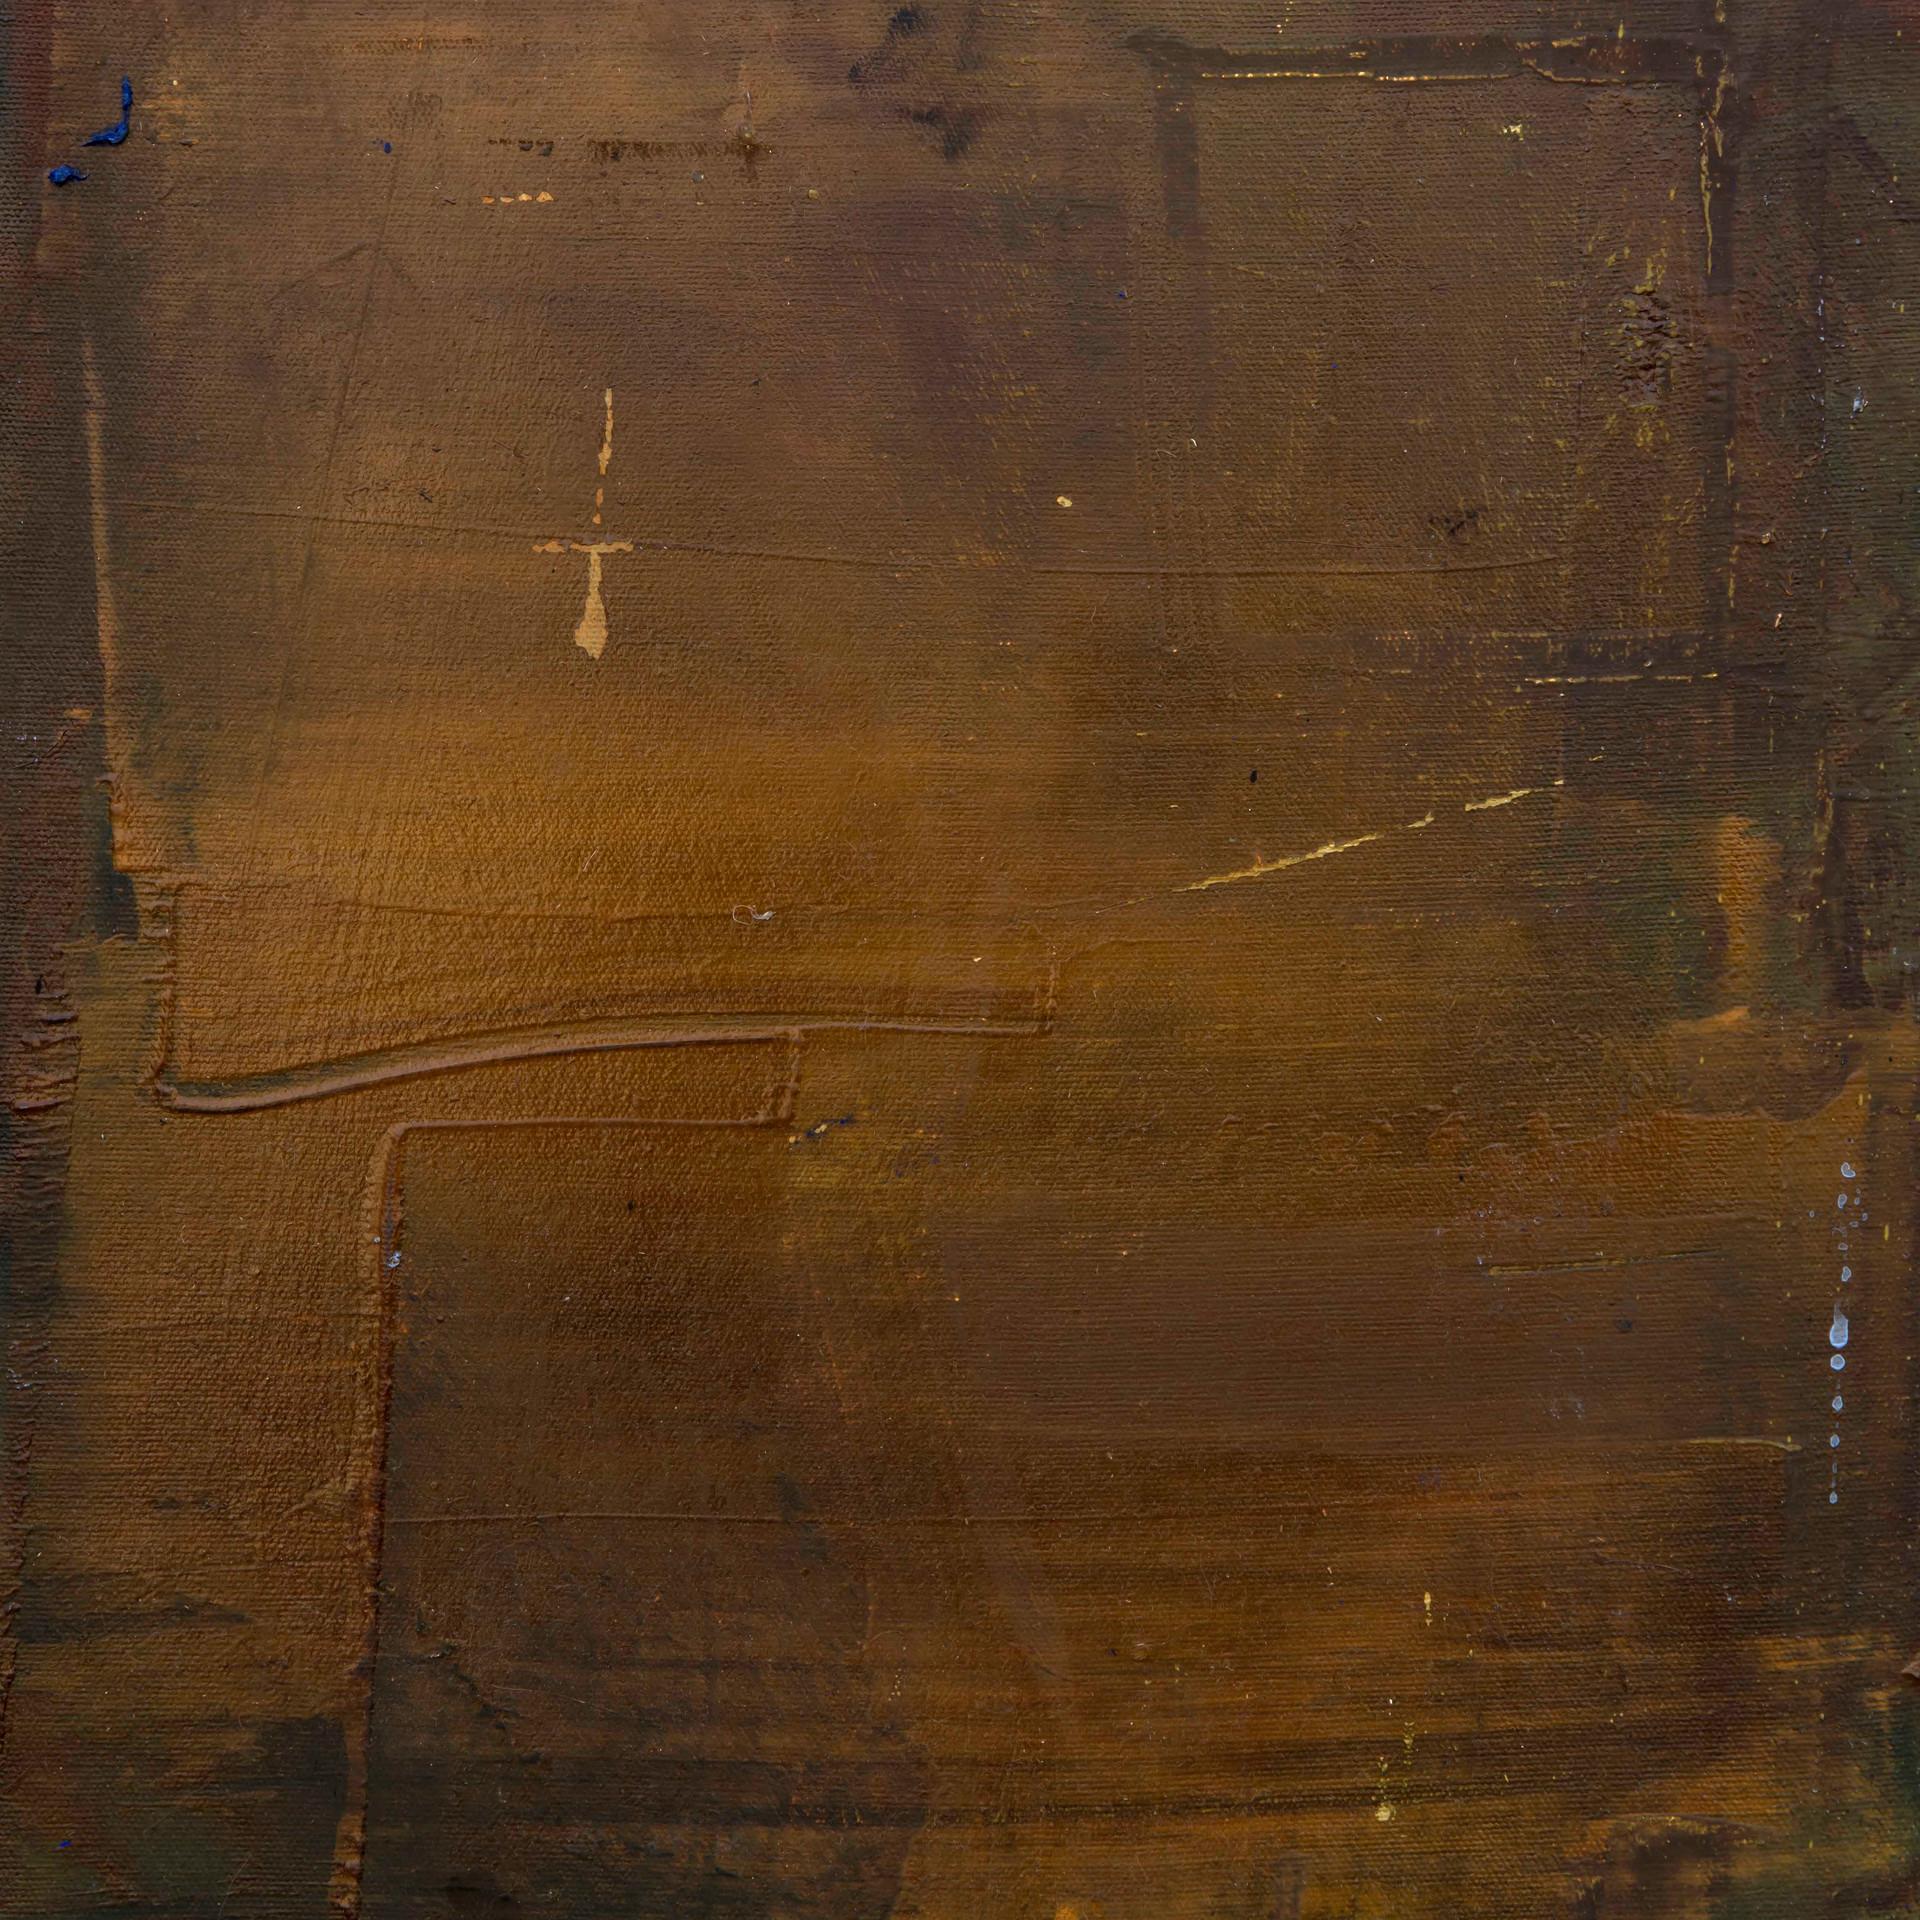 'Line Series' Oil on canvas, 35x30 cm